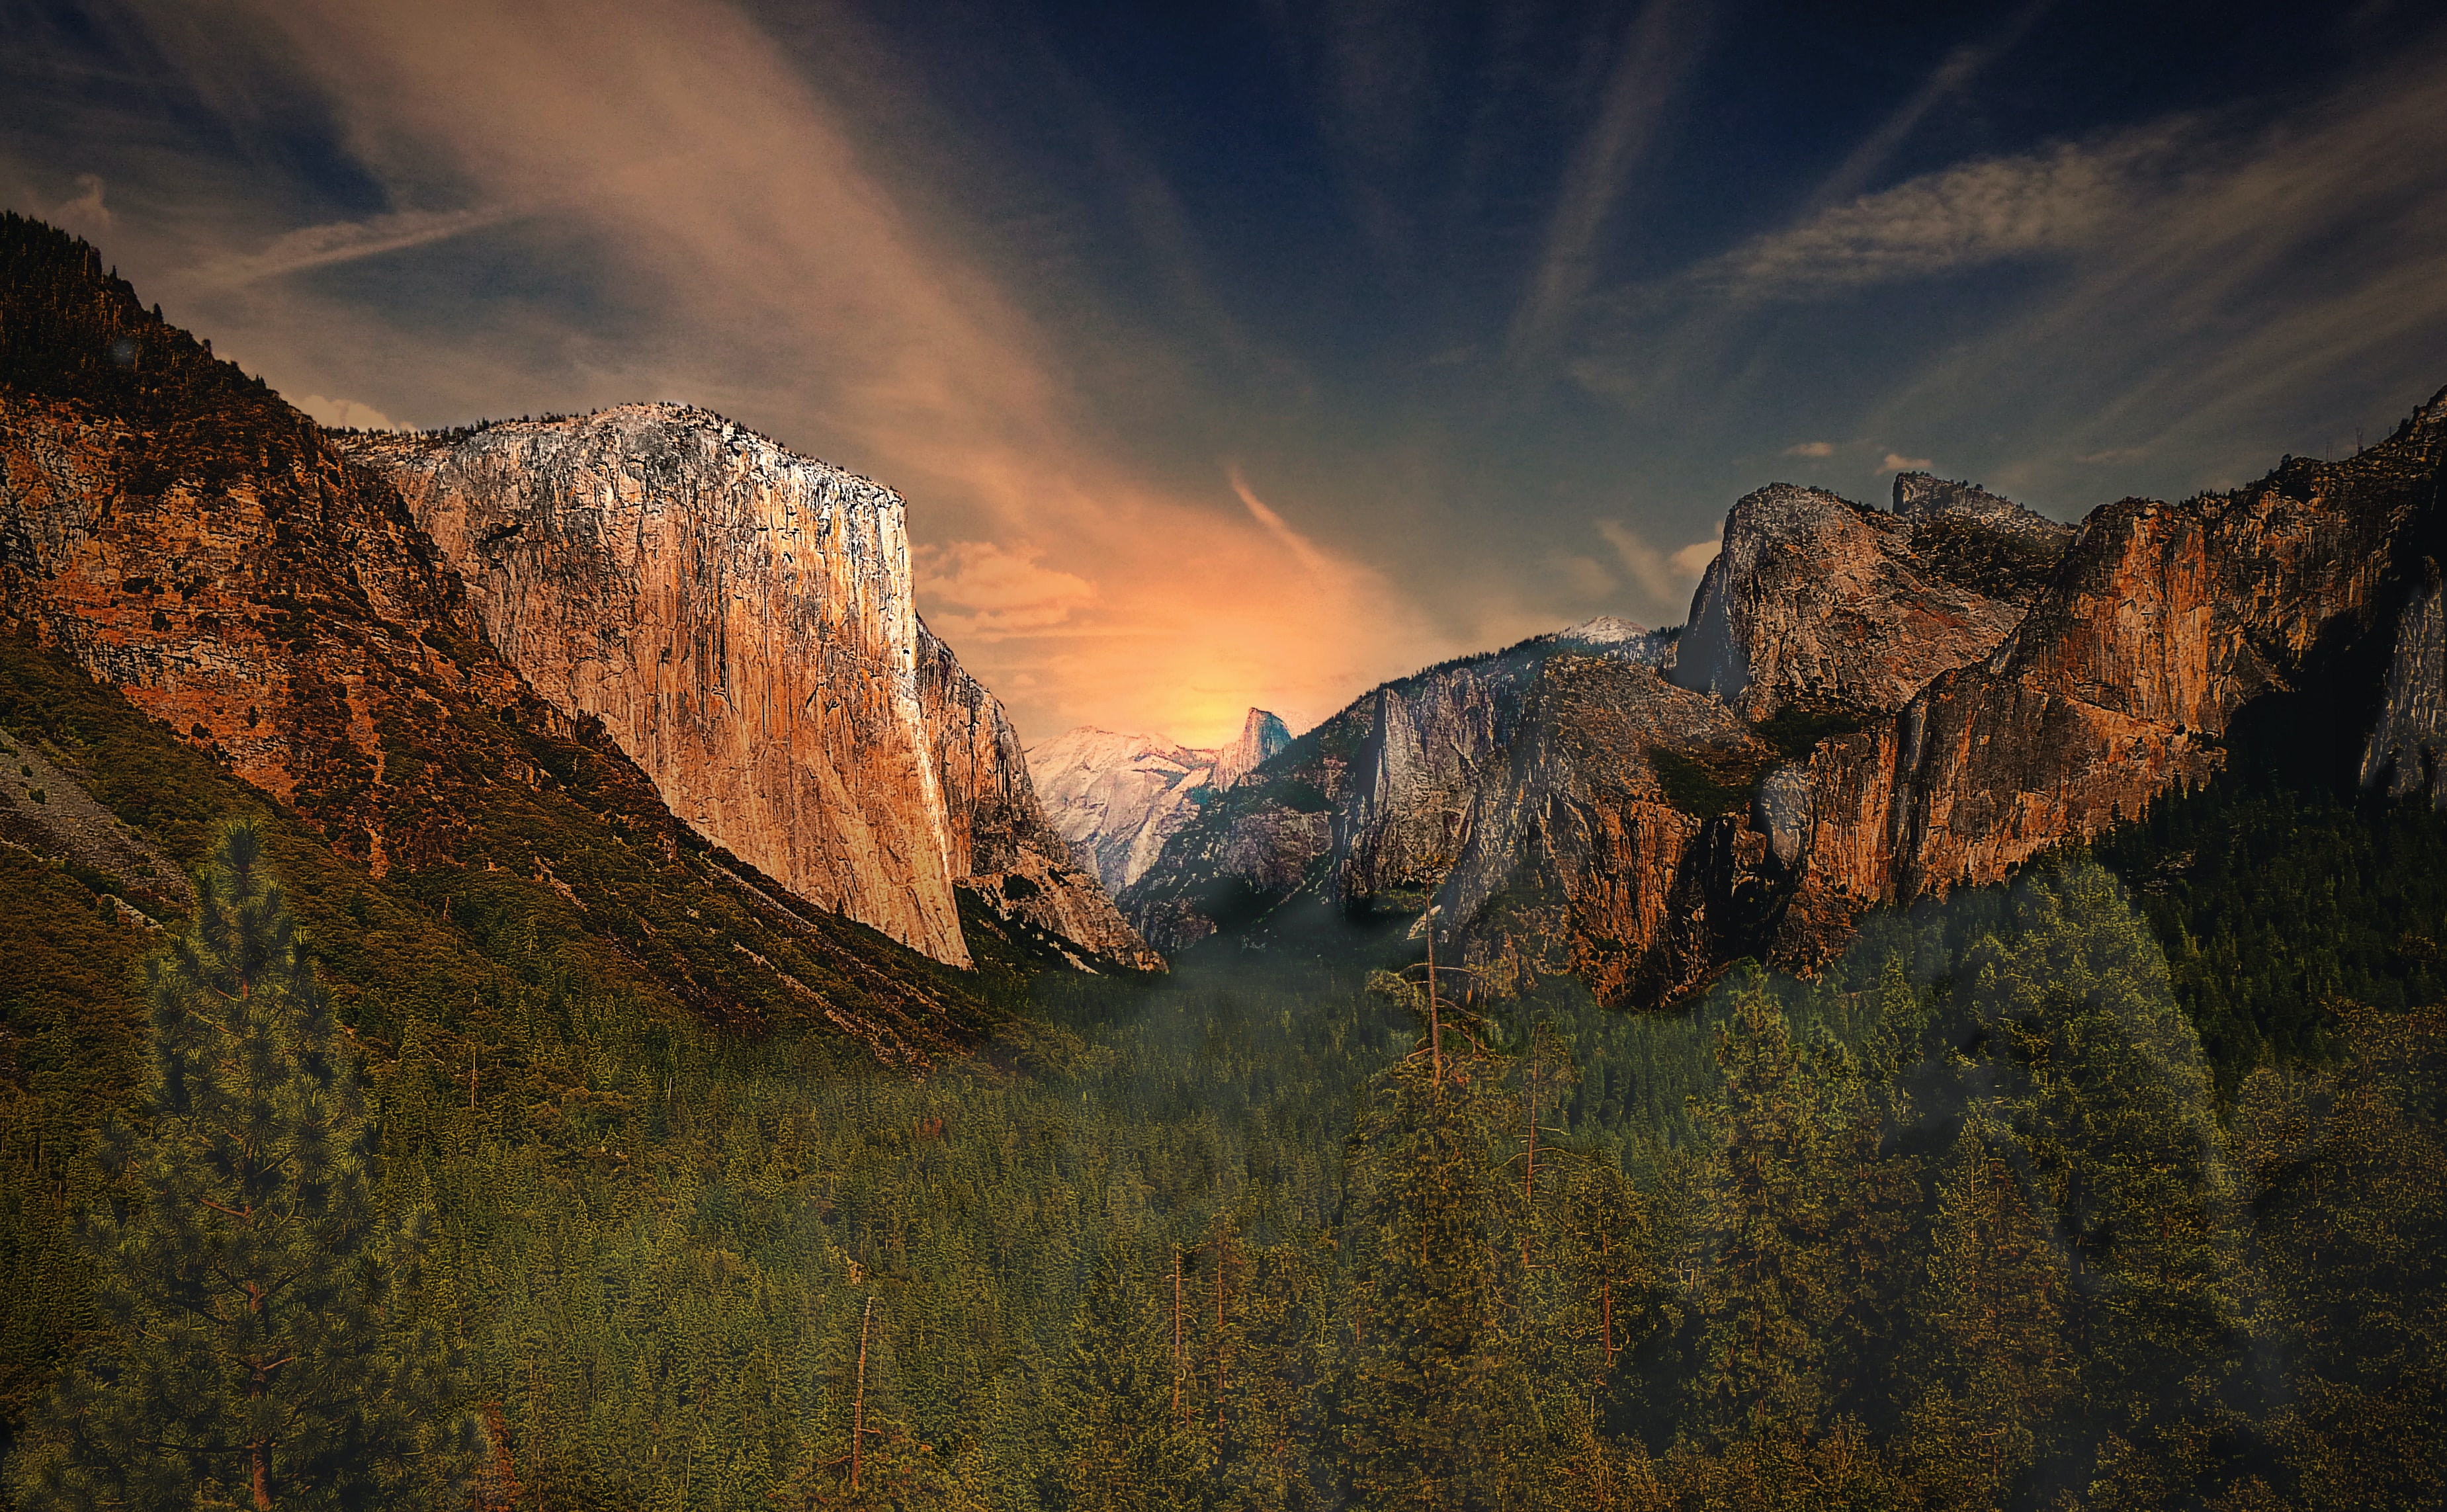 Fondos de pantalla Precioso valle Yosemite